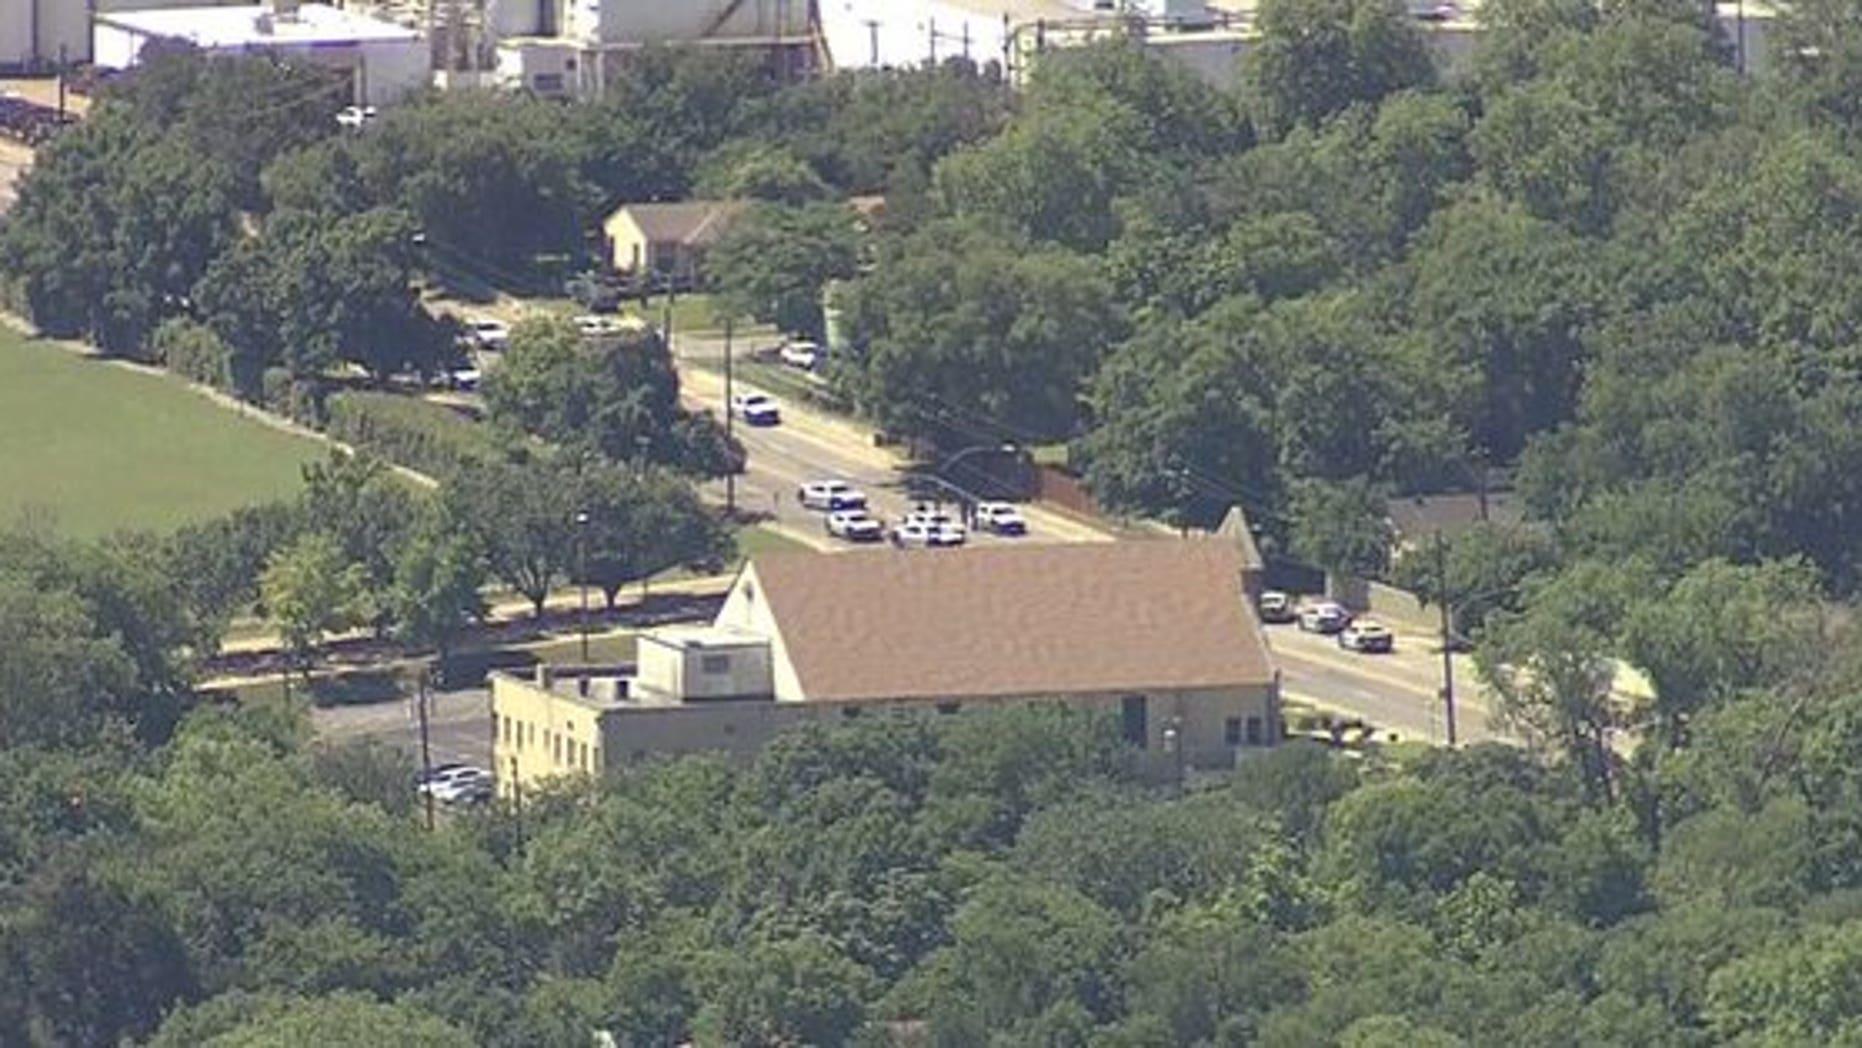 The shooting scene in Dallas.